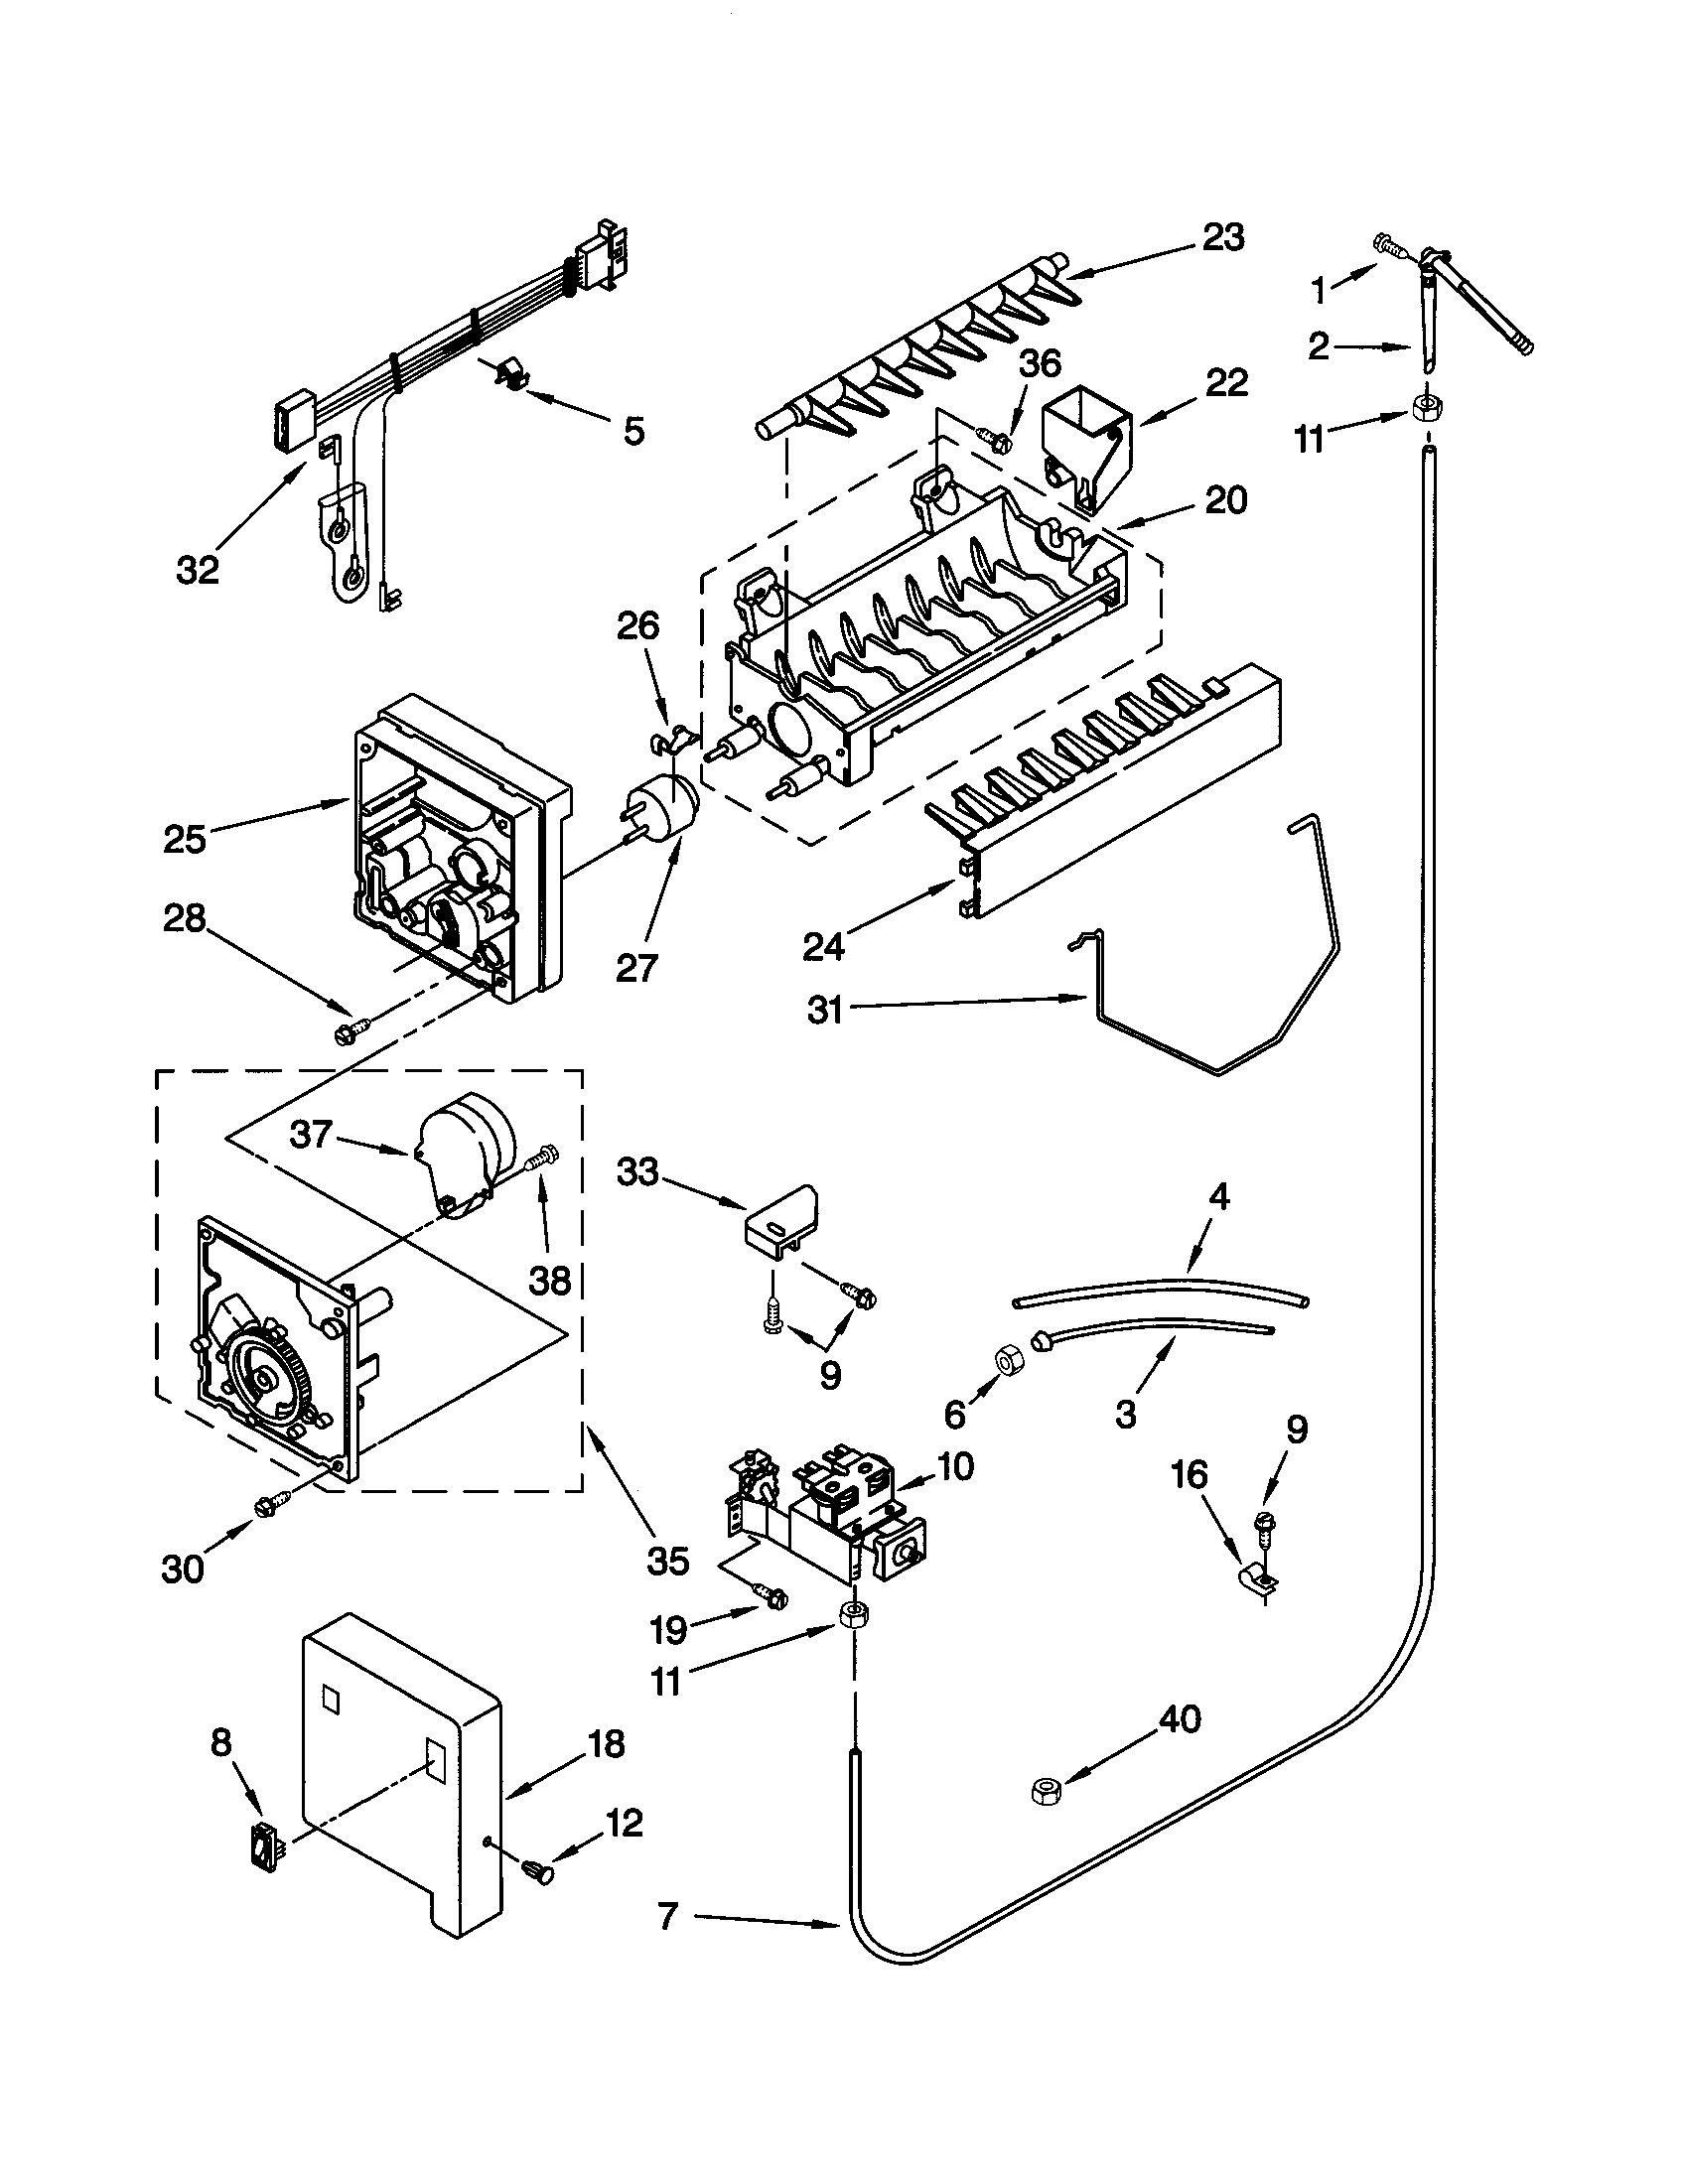 kenmore 106 refrigerator parts diagram sewing machine bobbin threading wiring library